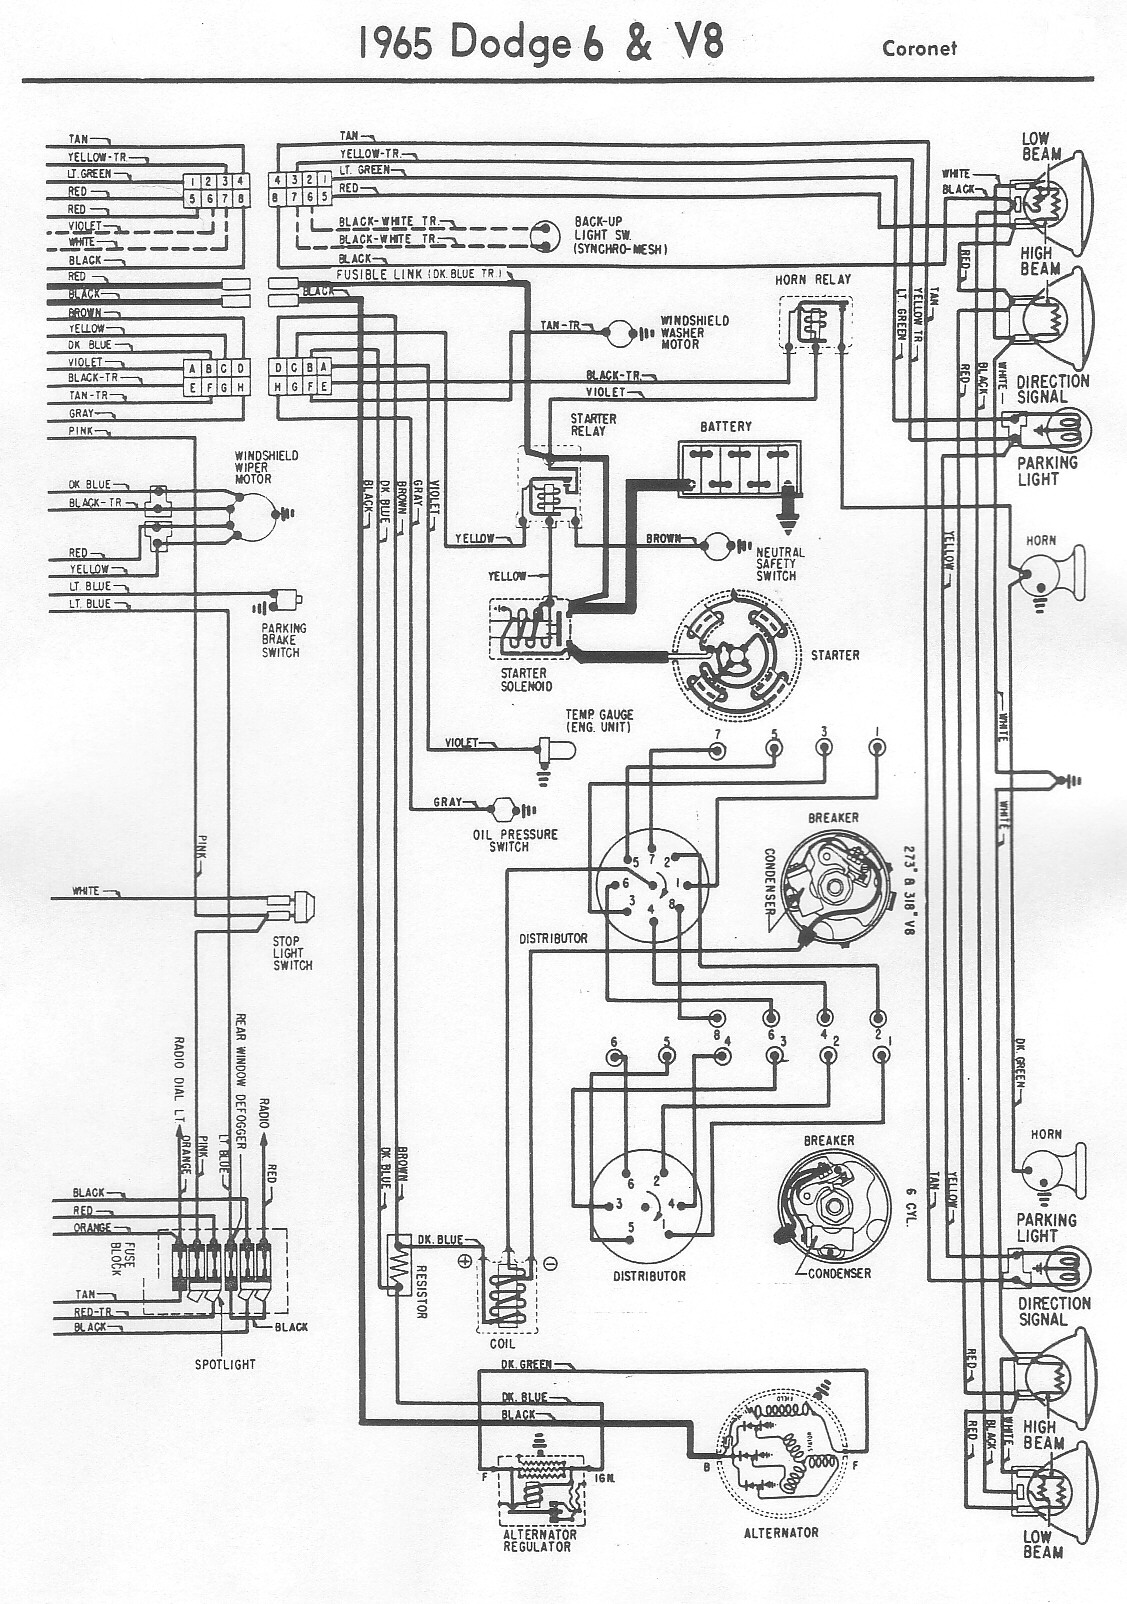 hight resolution of 1969 plymouth alternator wiring diagram wiring diagram z11966 plymouth alternator wiring wiring diagram battery to alternator